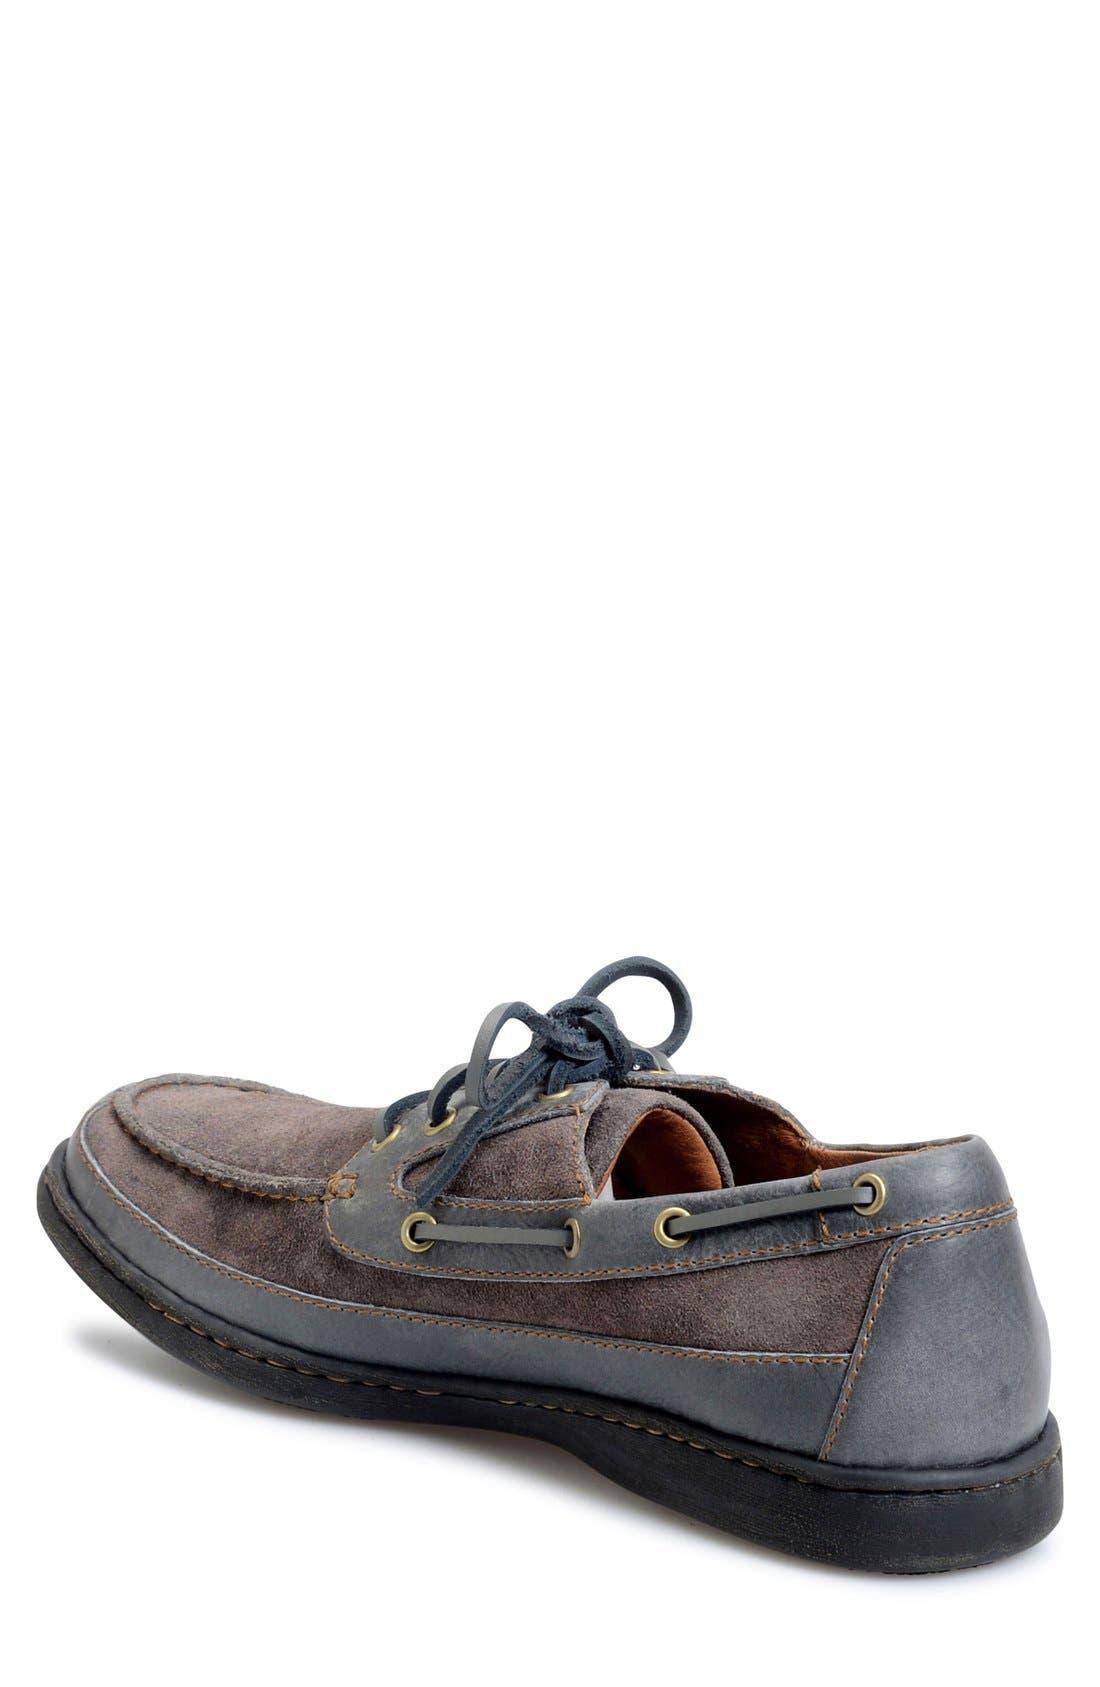 'Harwich' Boat Shoe,                             Alternate thumbnail 4, color,